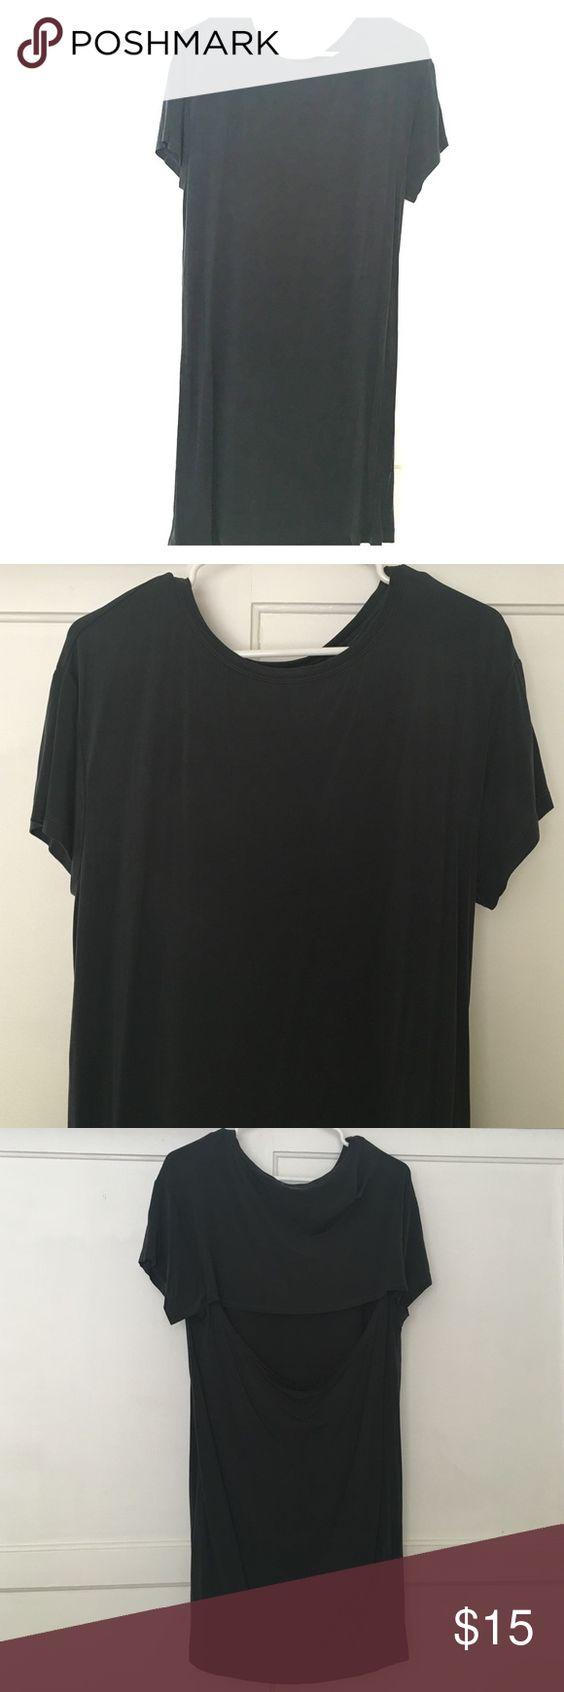 Open back tunic 93% Cupro 7% Spandex / never worn H&M Tops Tunics